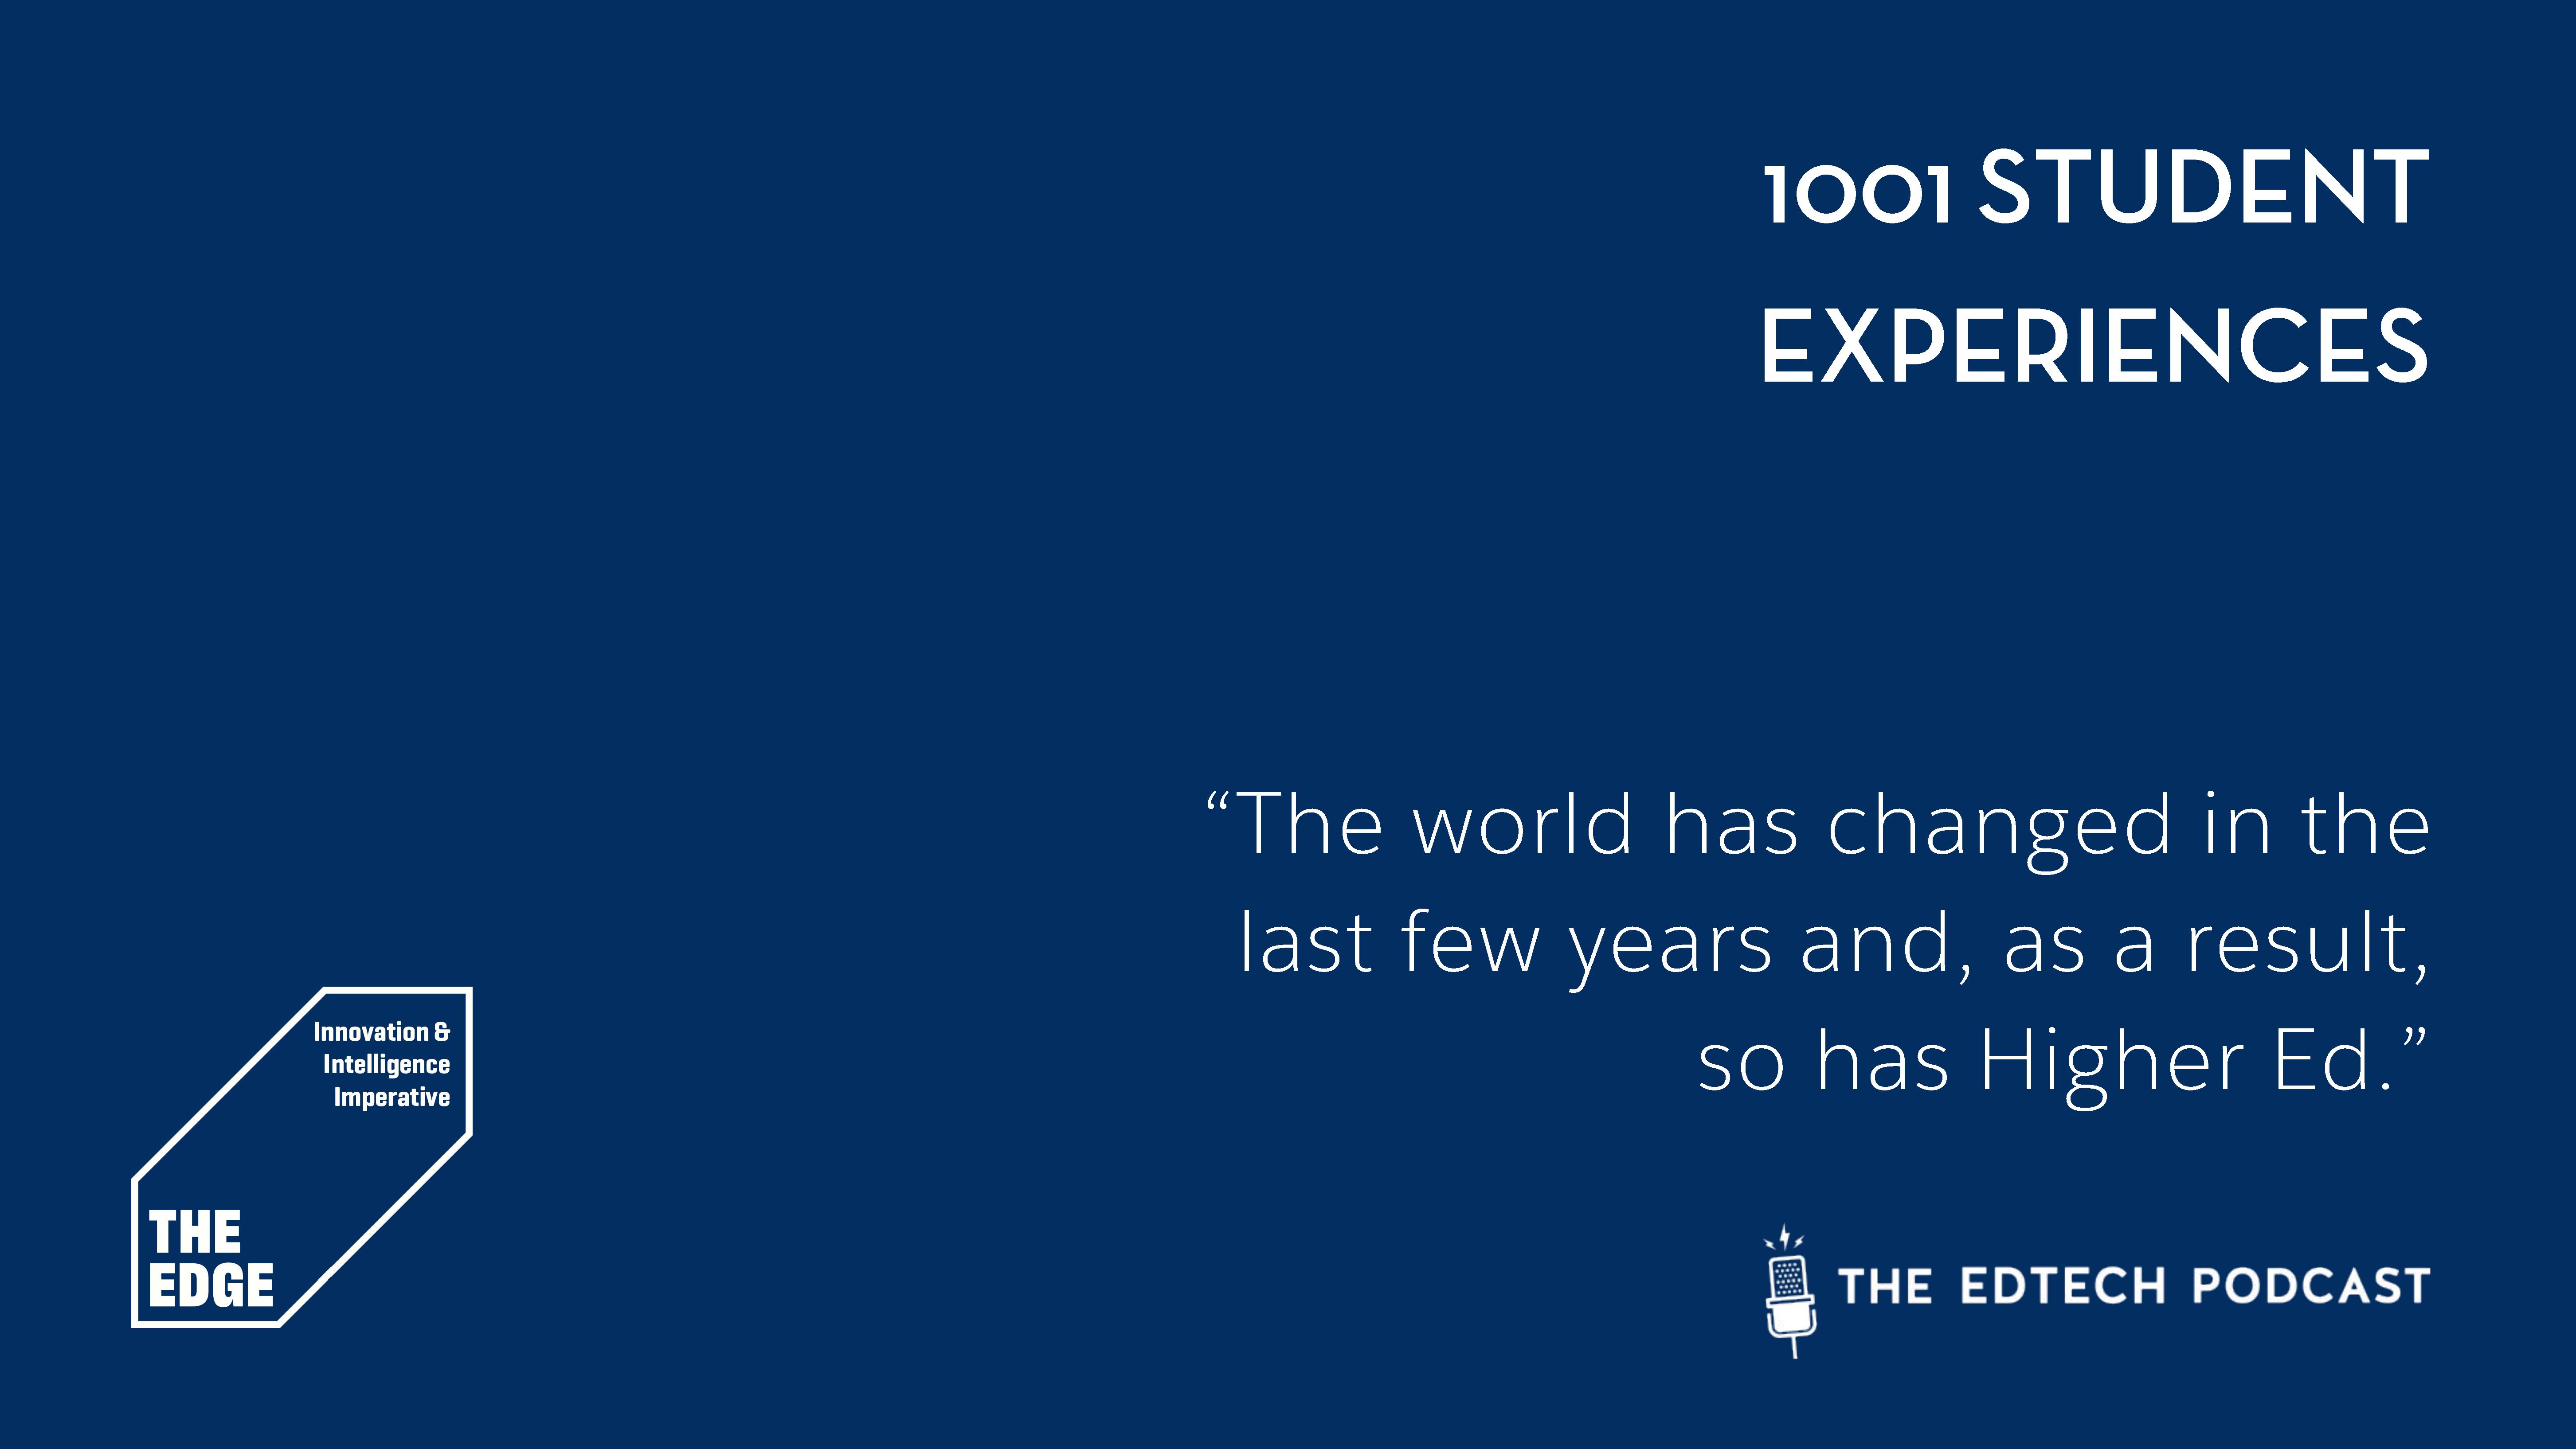 Episode 5 | 1001 Student Experiences